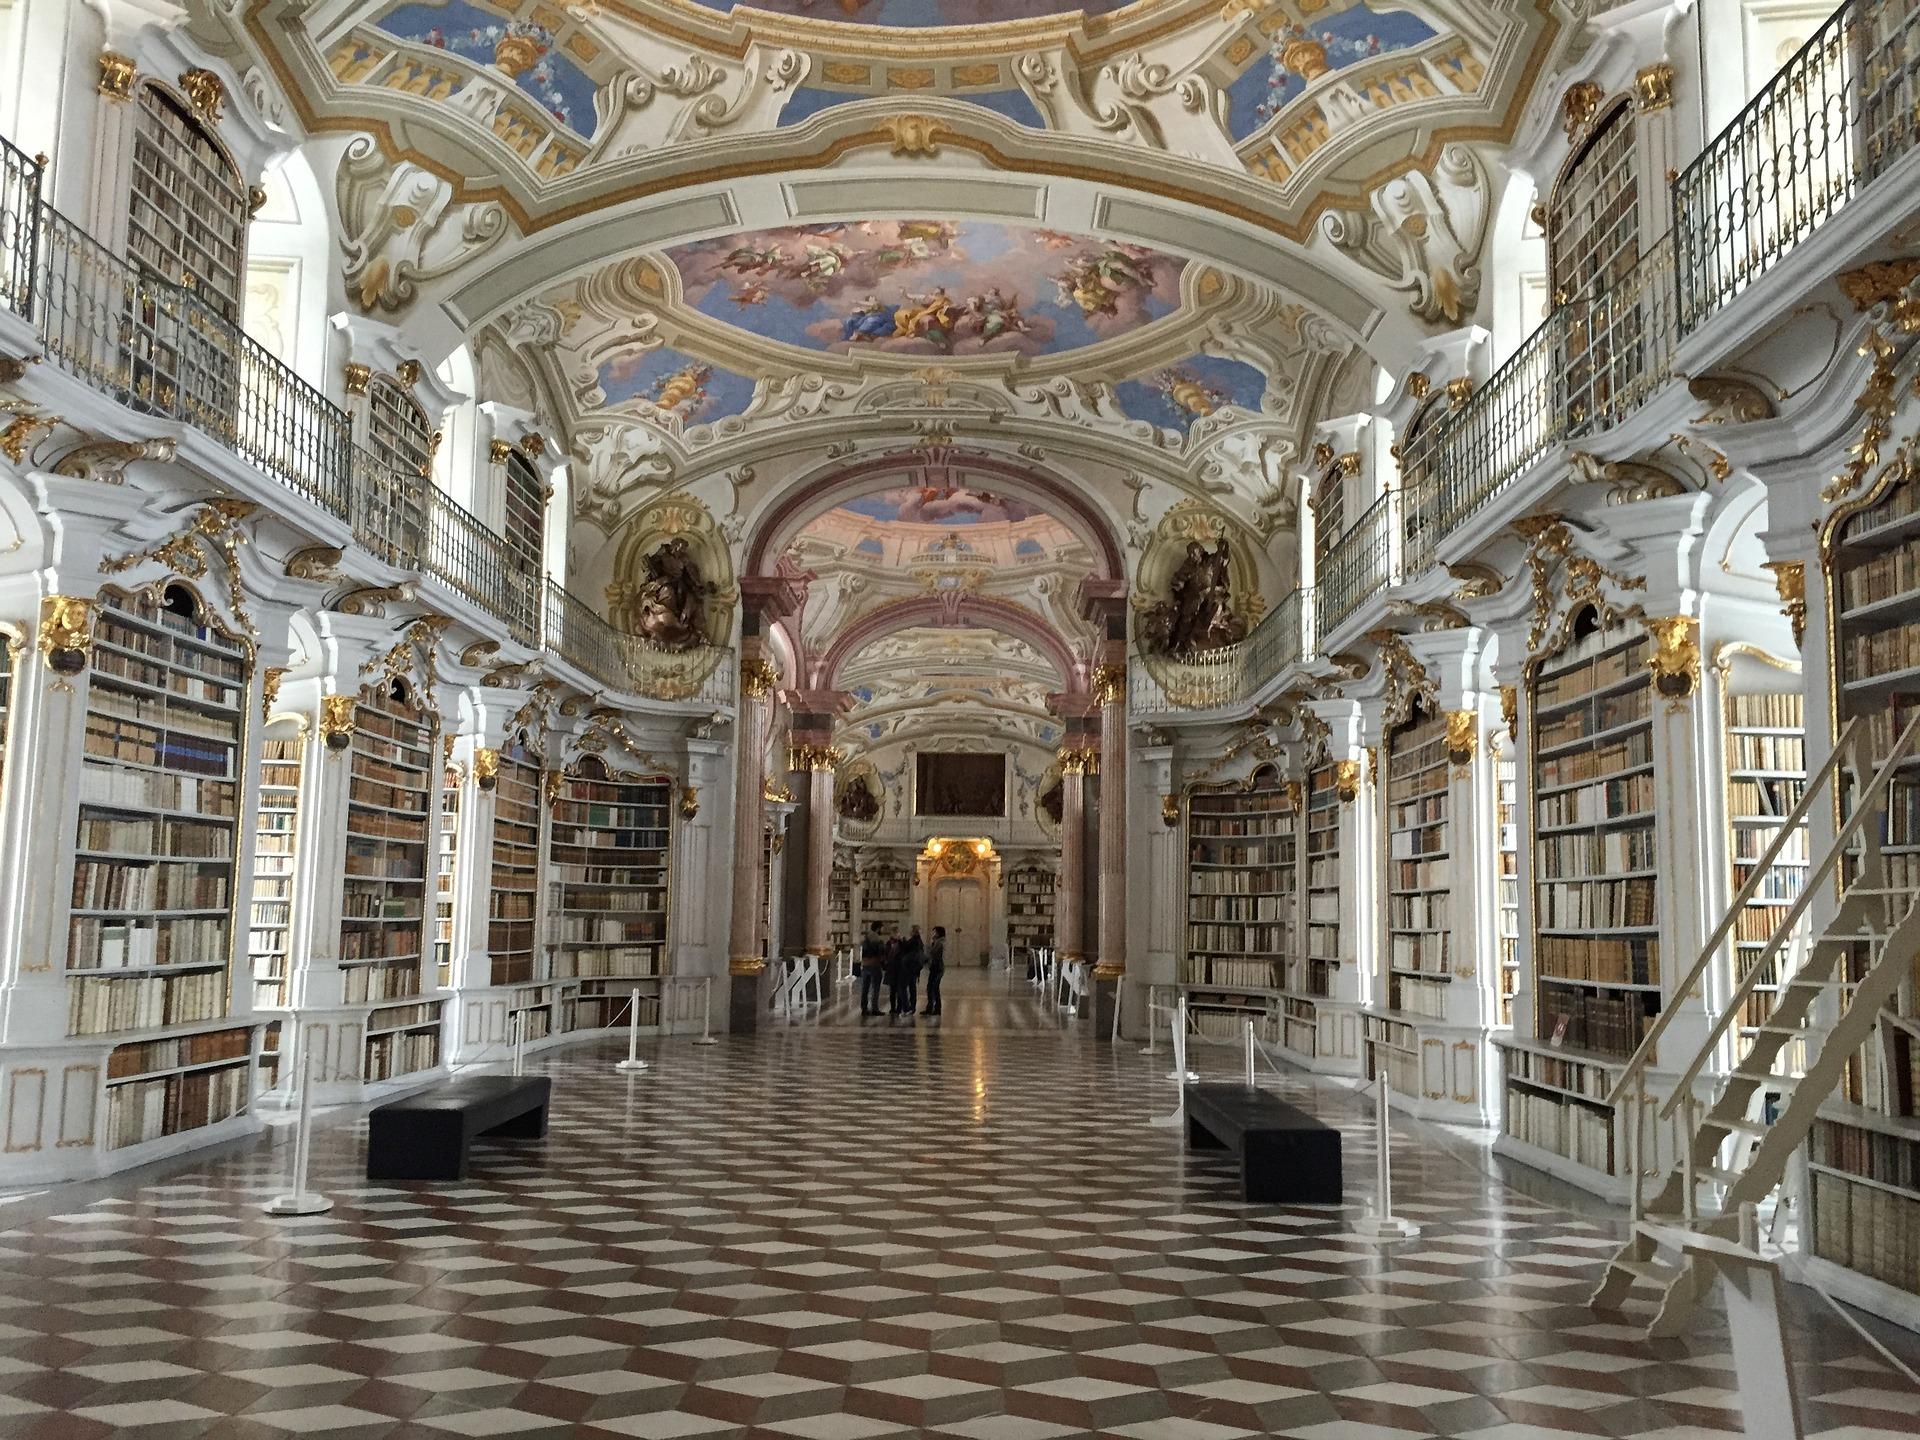 Atemberaubend: Admonter Stiftsbibliothek